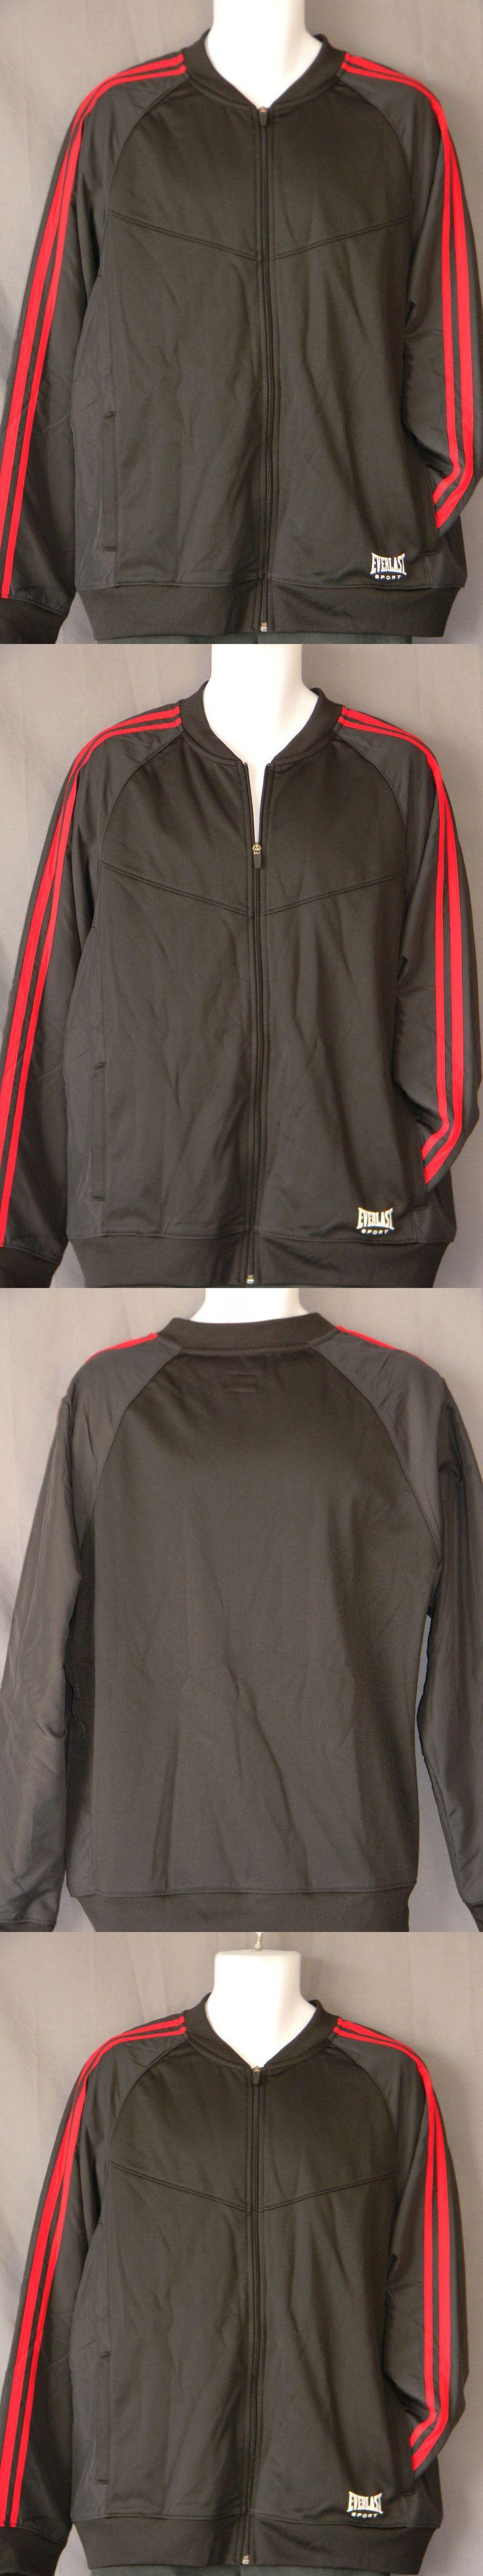 Jackets 179771: Everlast Full Zip Jacket Mens Gym Training New Black Coat Workout Mma Boxing -> BUY IT NOW ONLY: $44.99 on eBay!